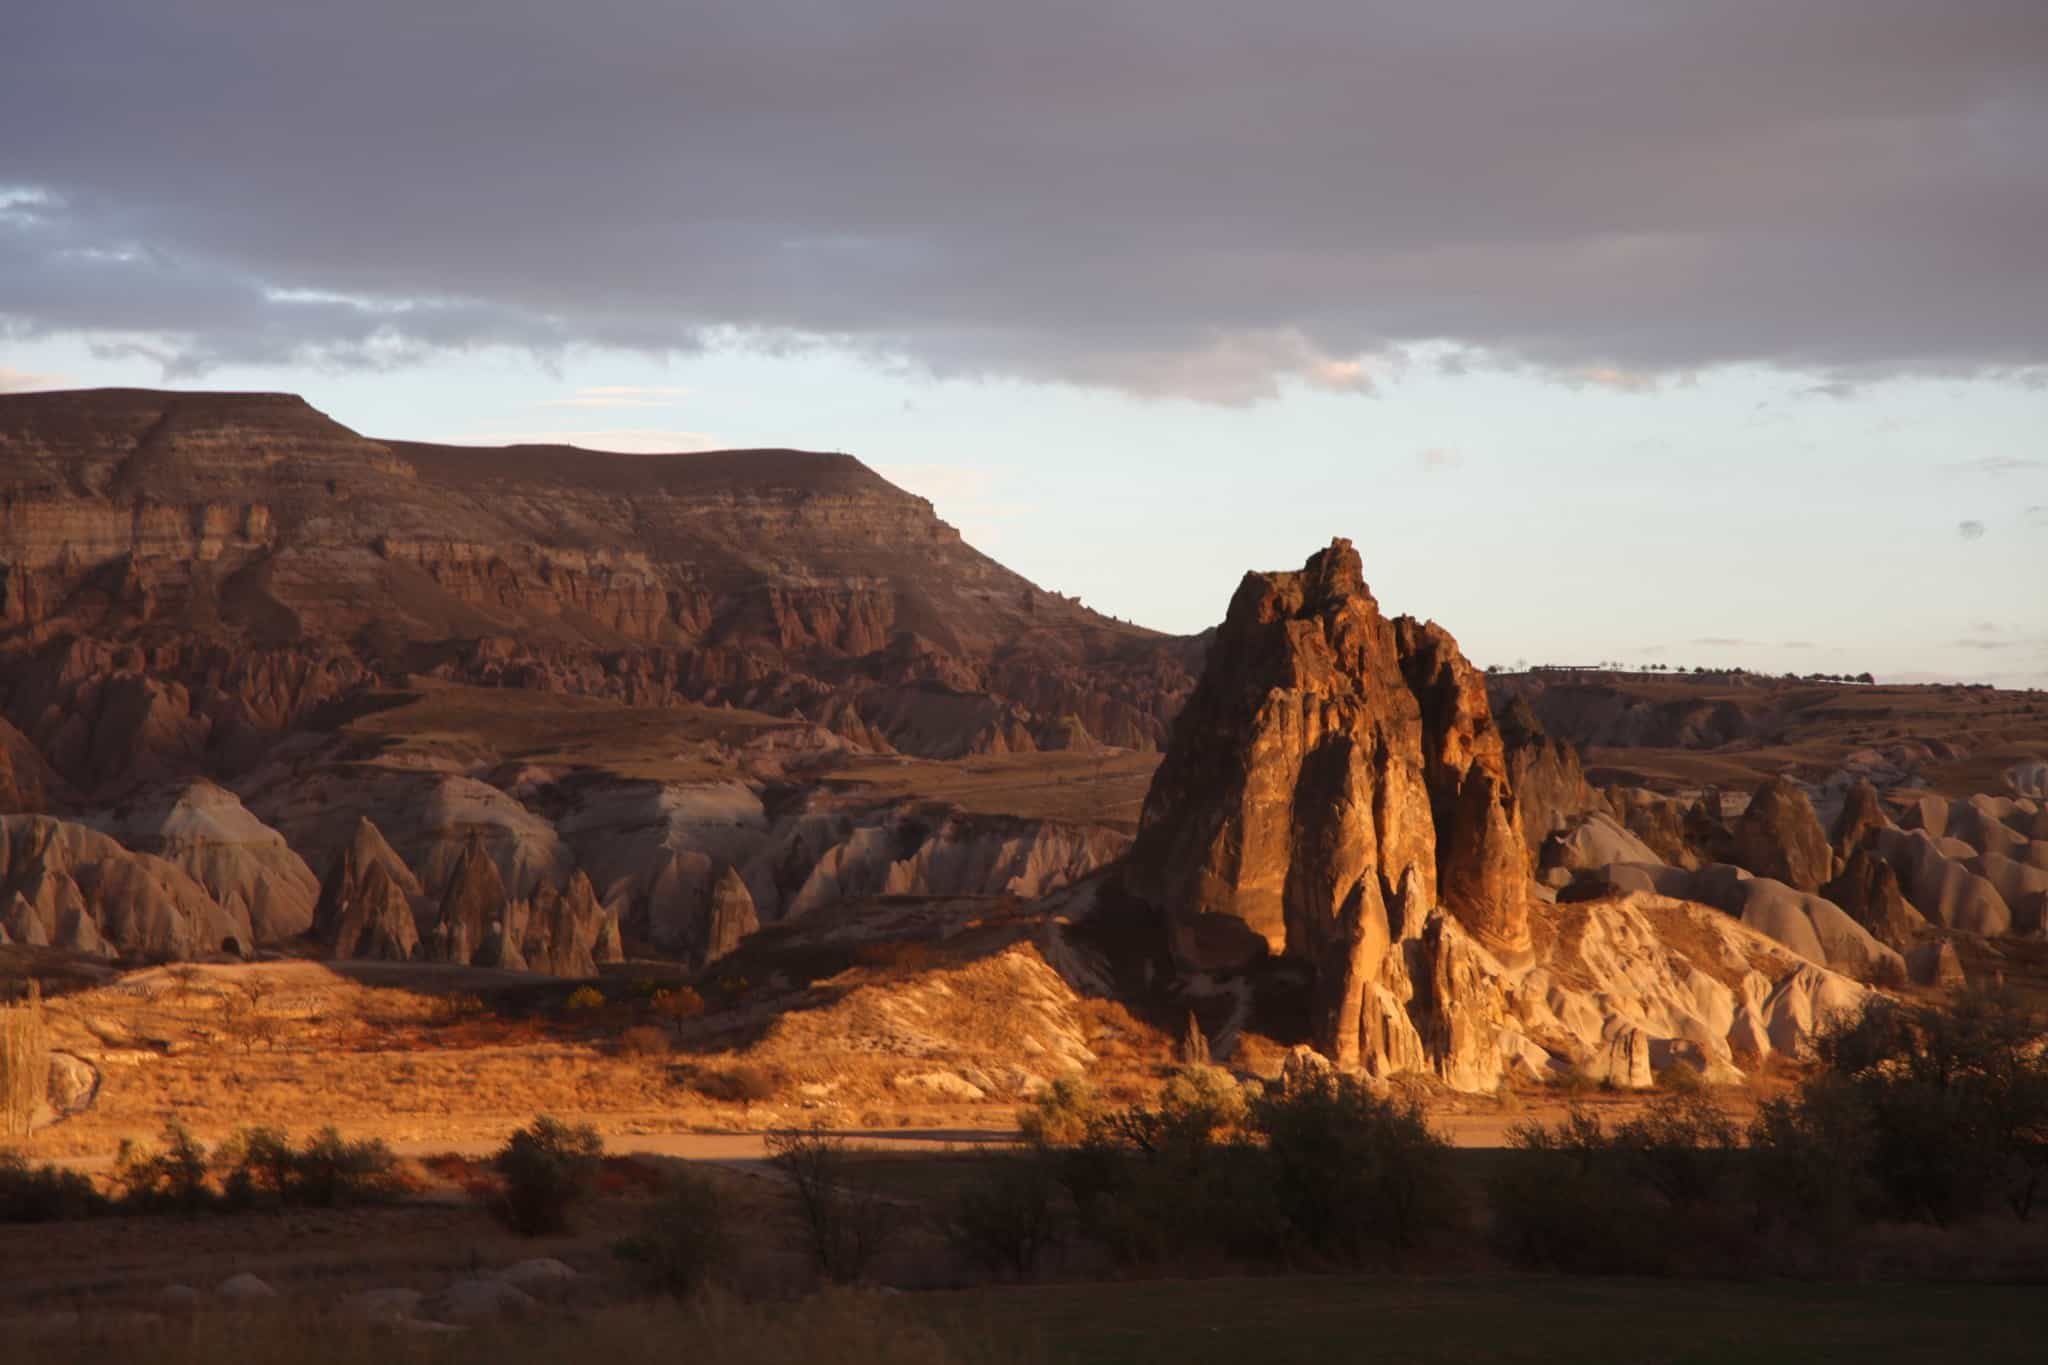 Cappadocia Monolith